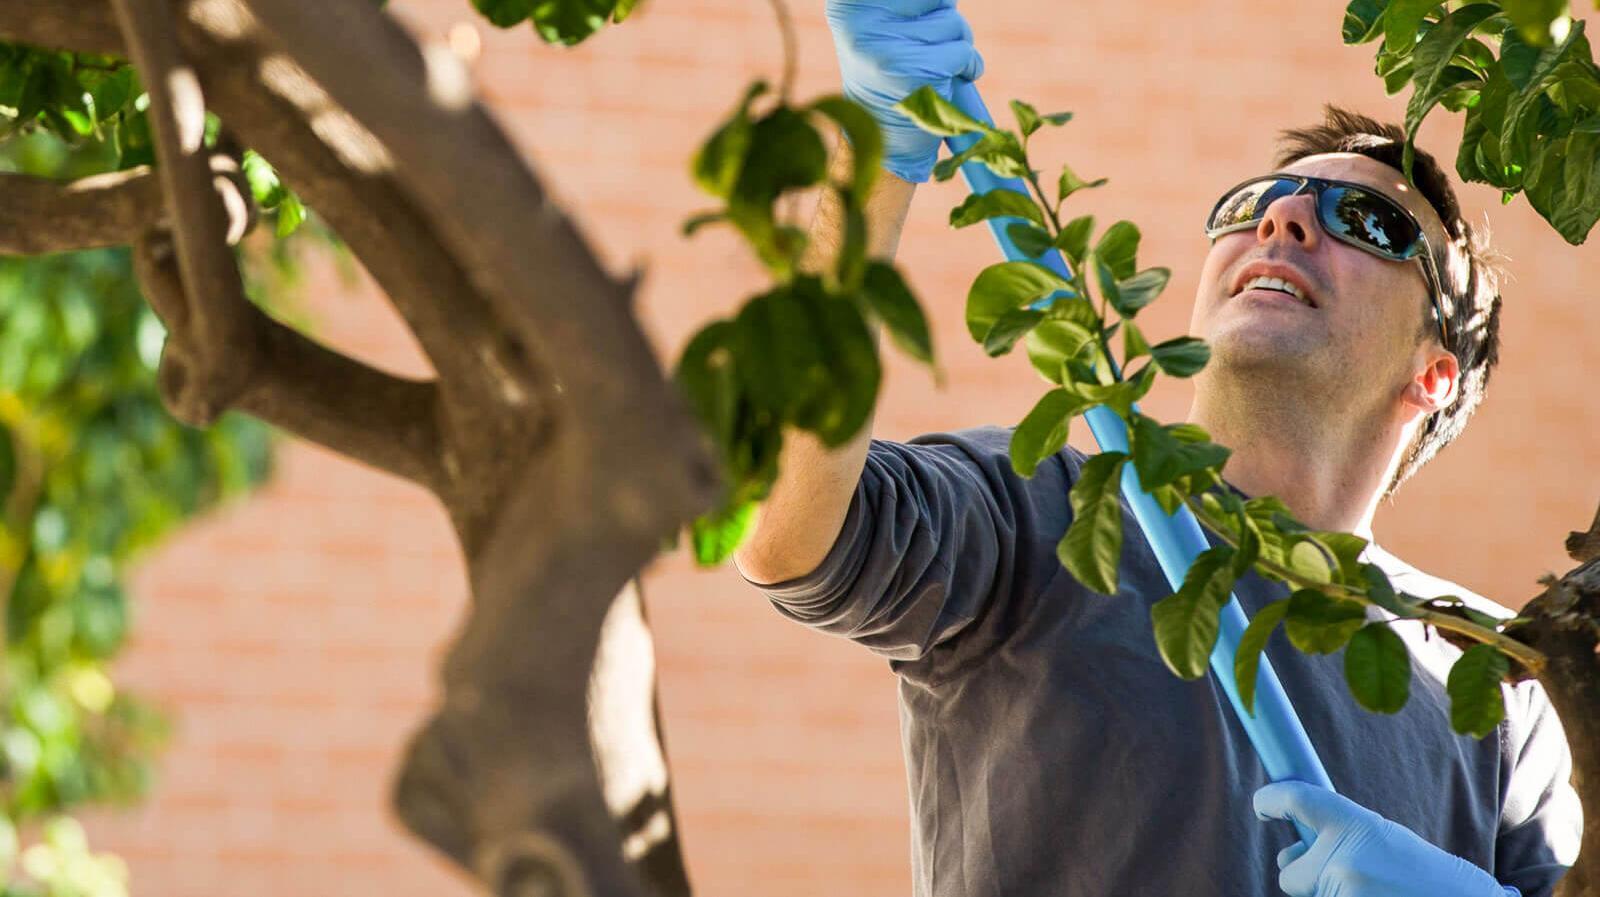 David Fought, graduate student, studies a tree